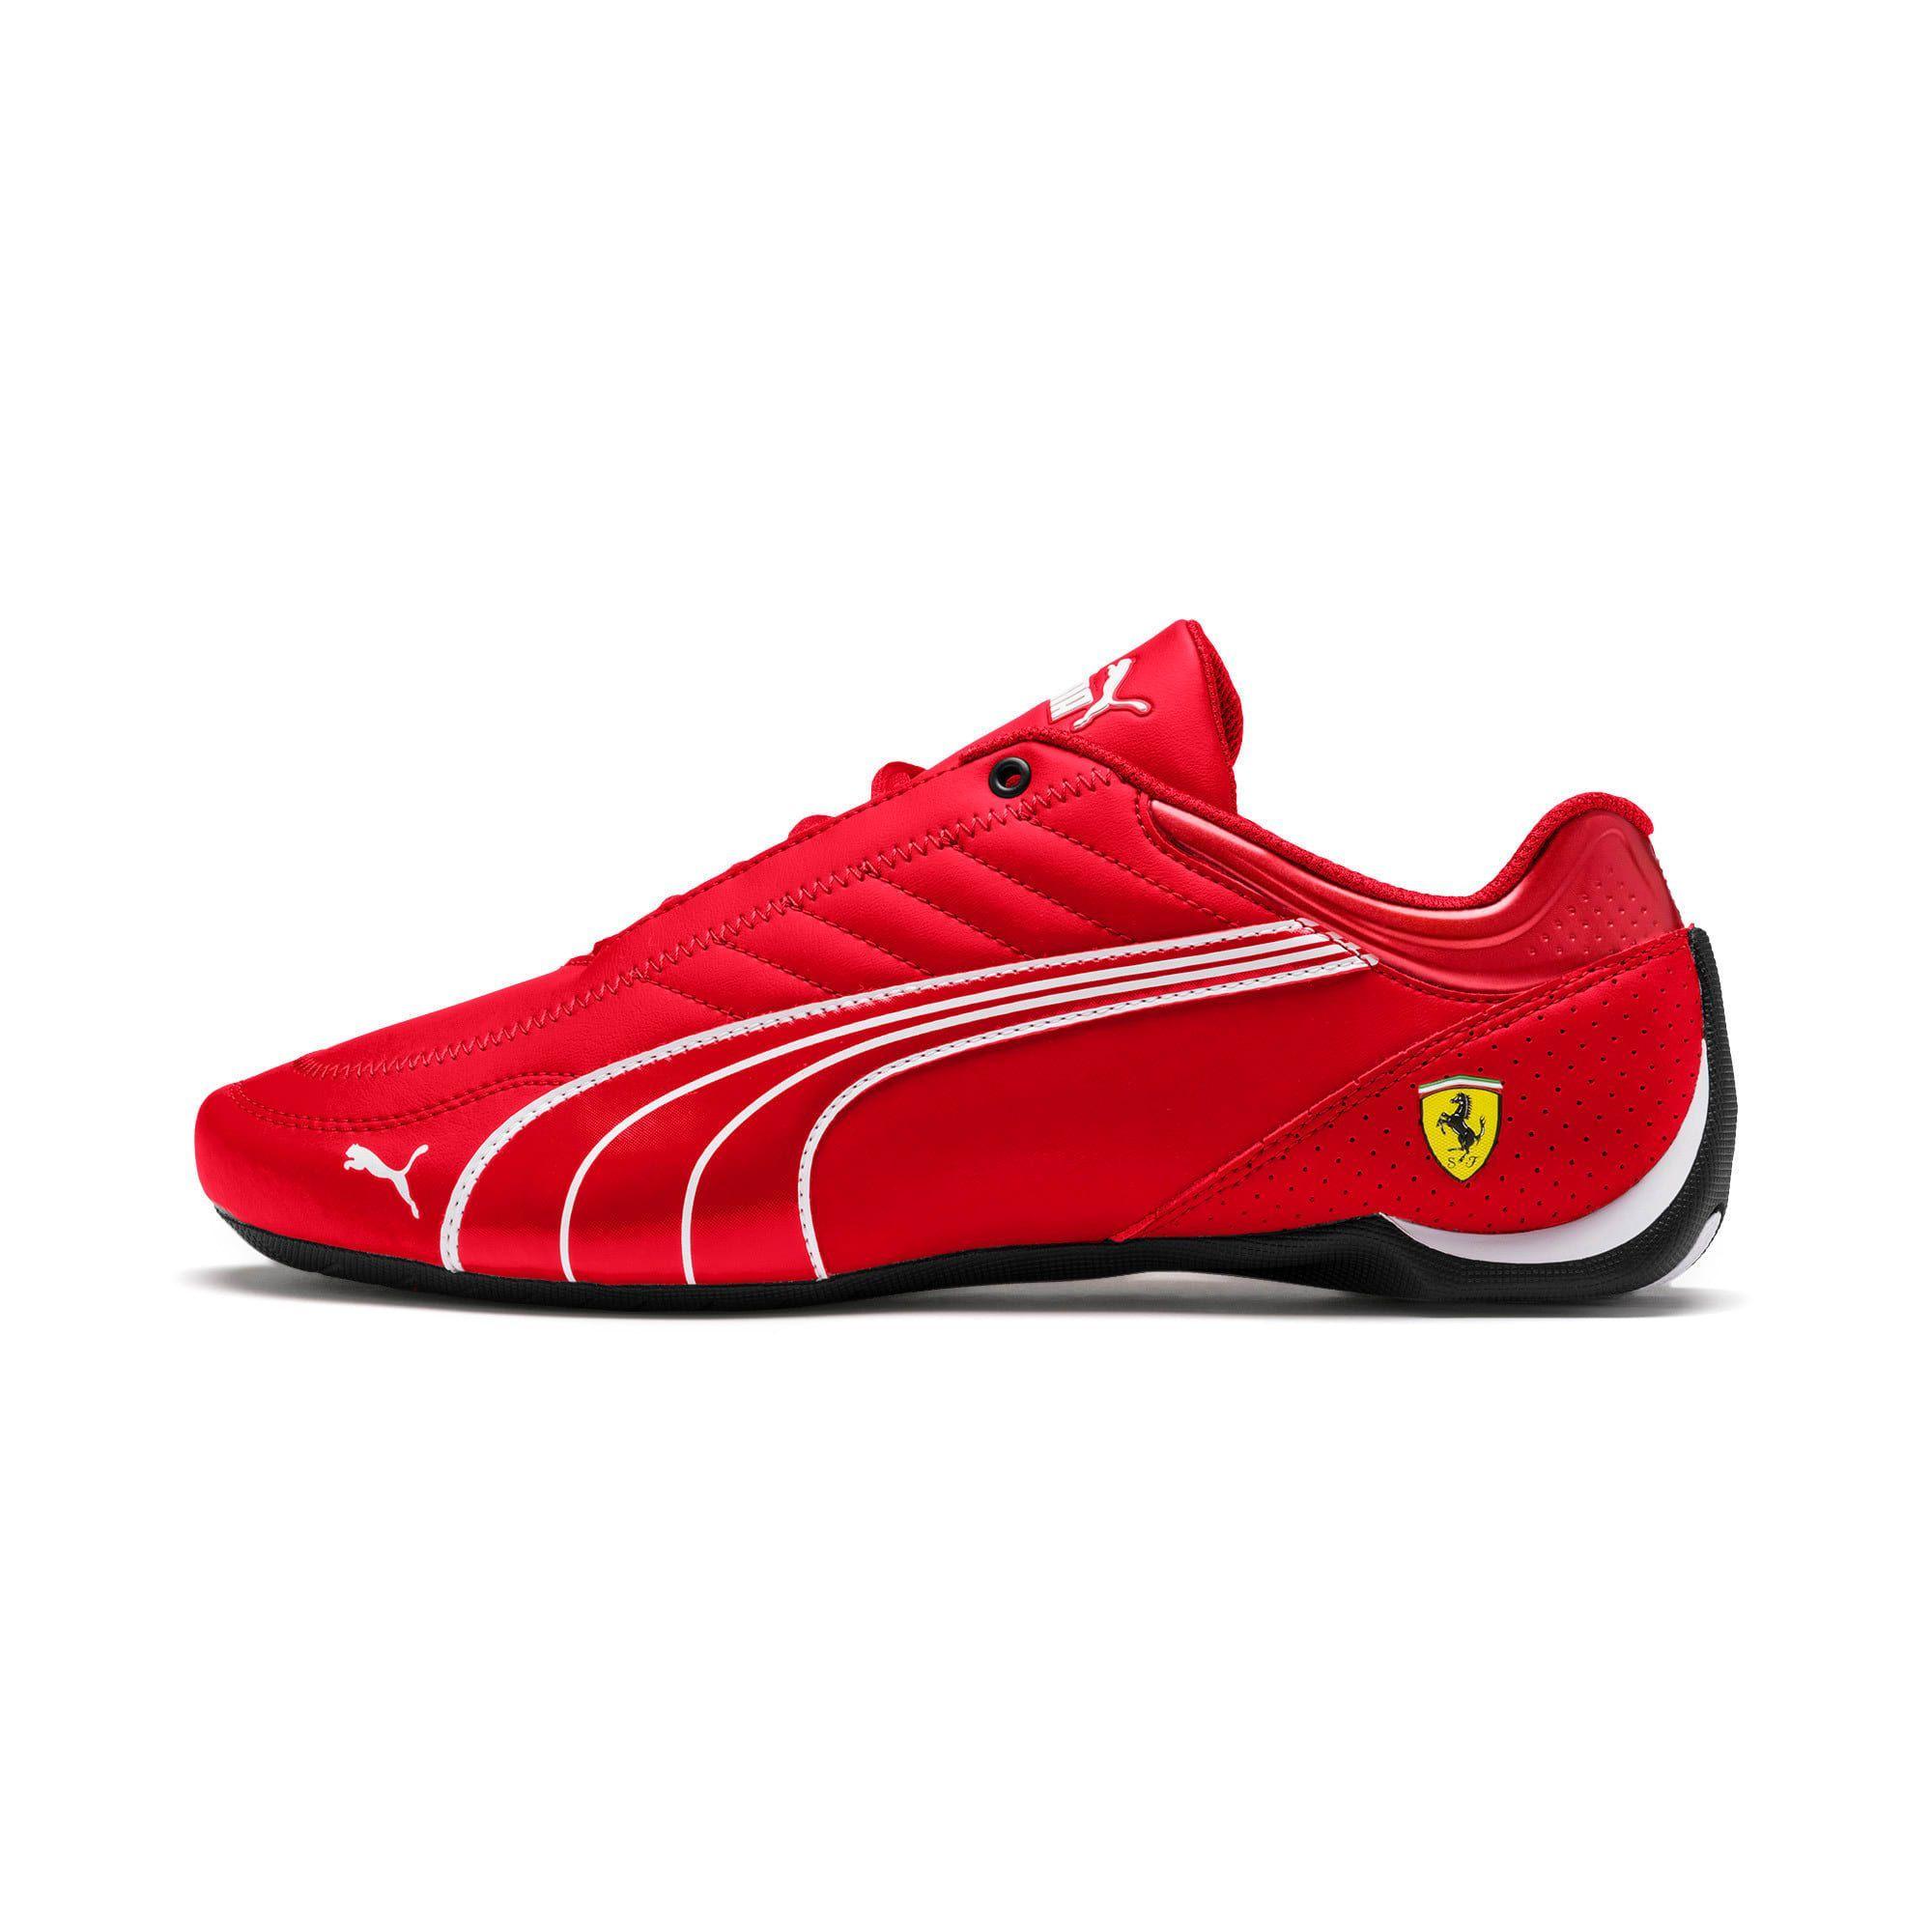 PUMA Ferrari Future Kart Cat Sneakers red color size 10.5